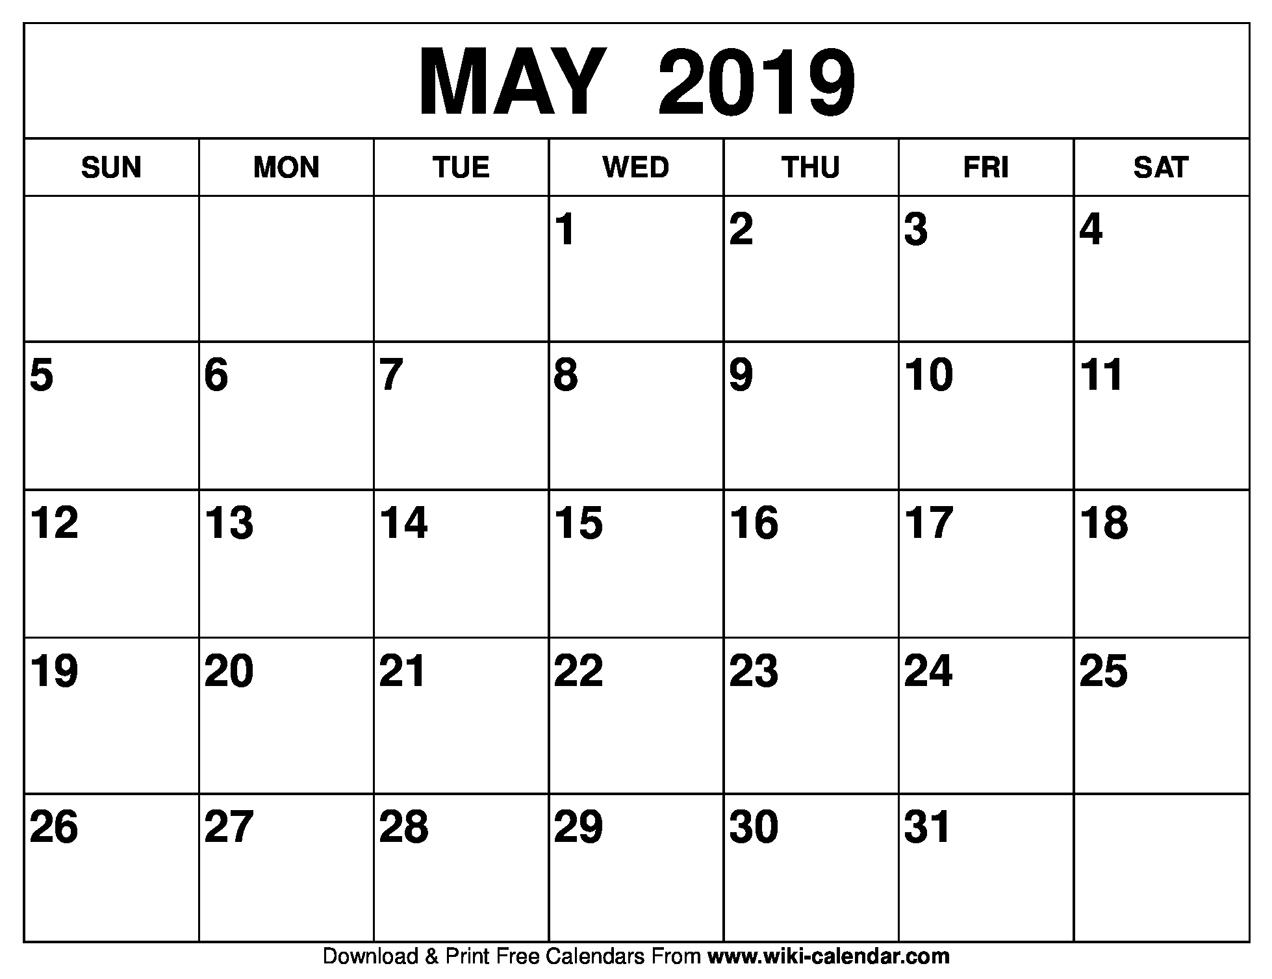 2019 May Calendar May 2019 Activity Calendar – Babcock Community Care Centre